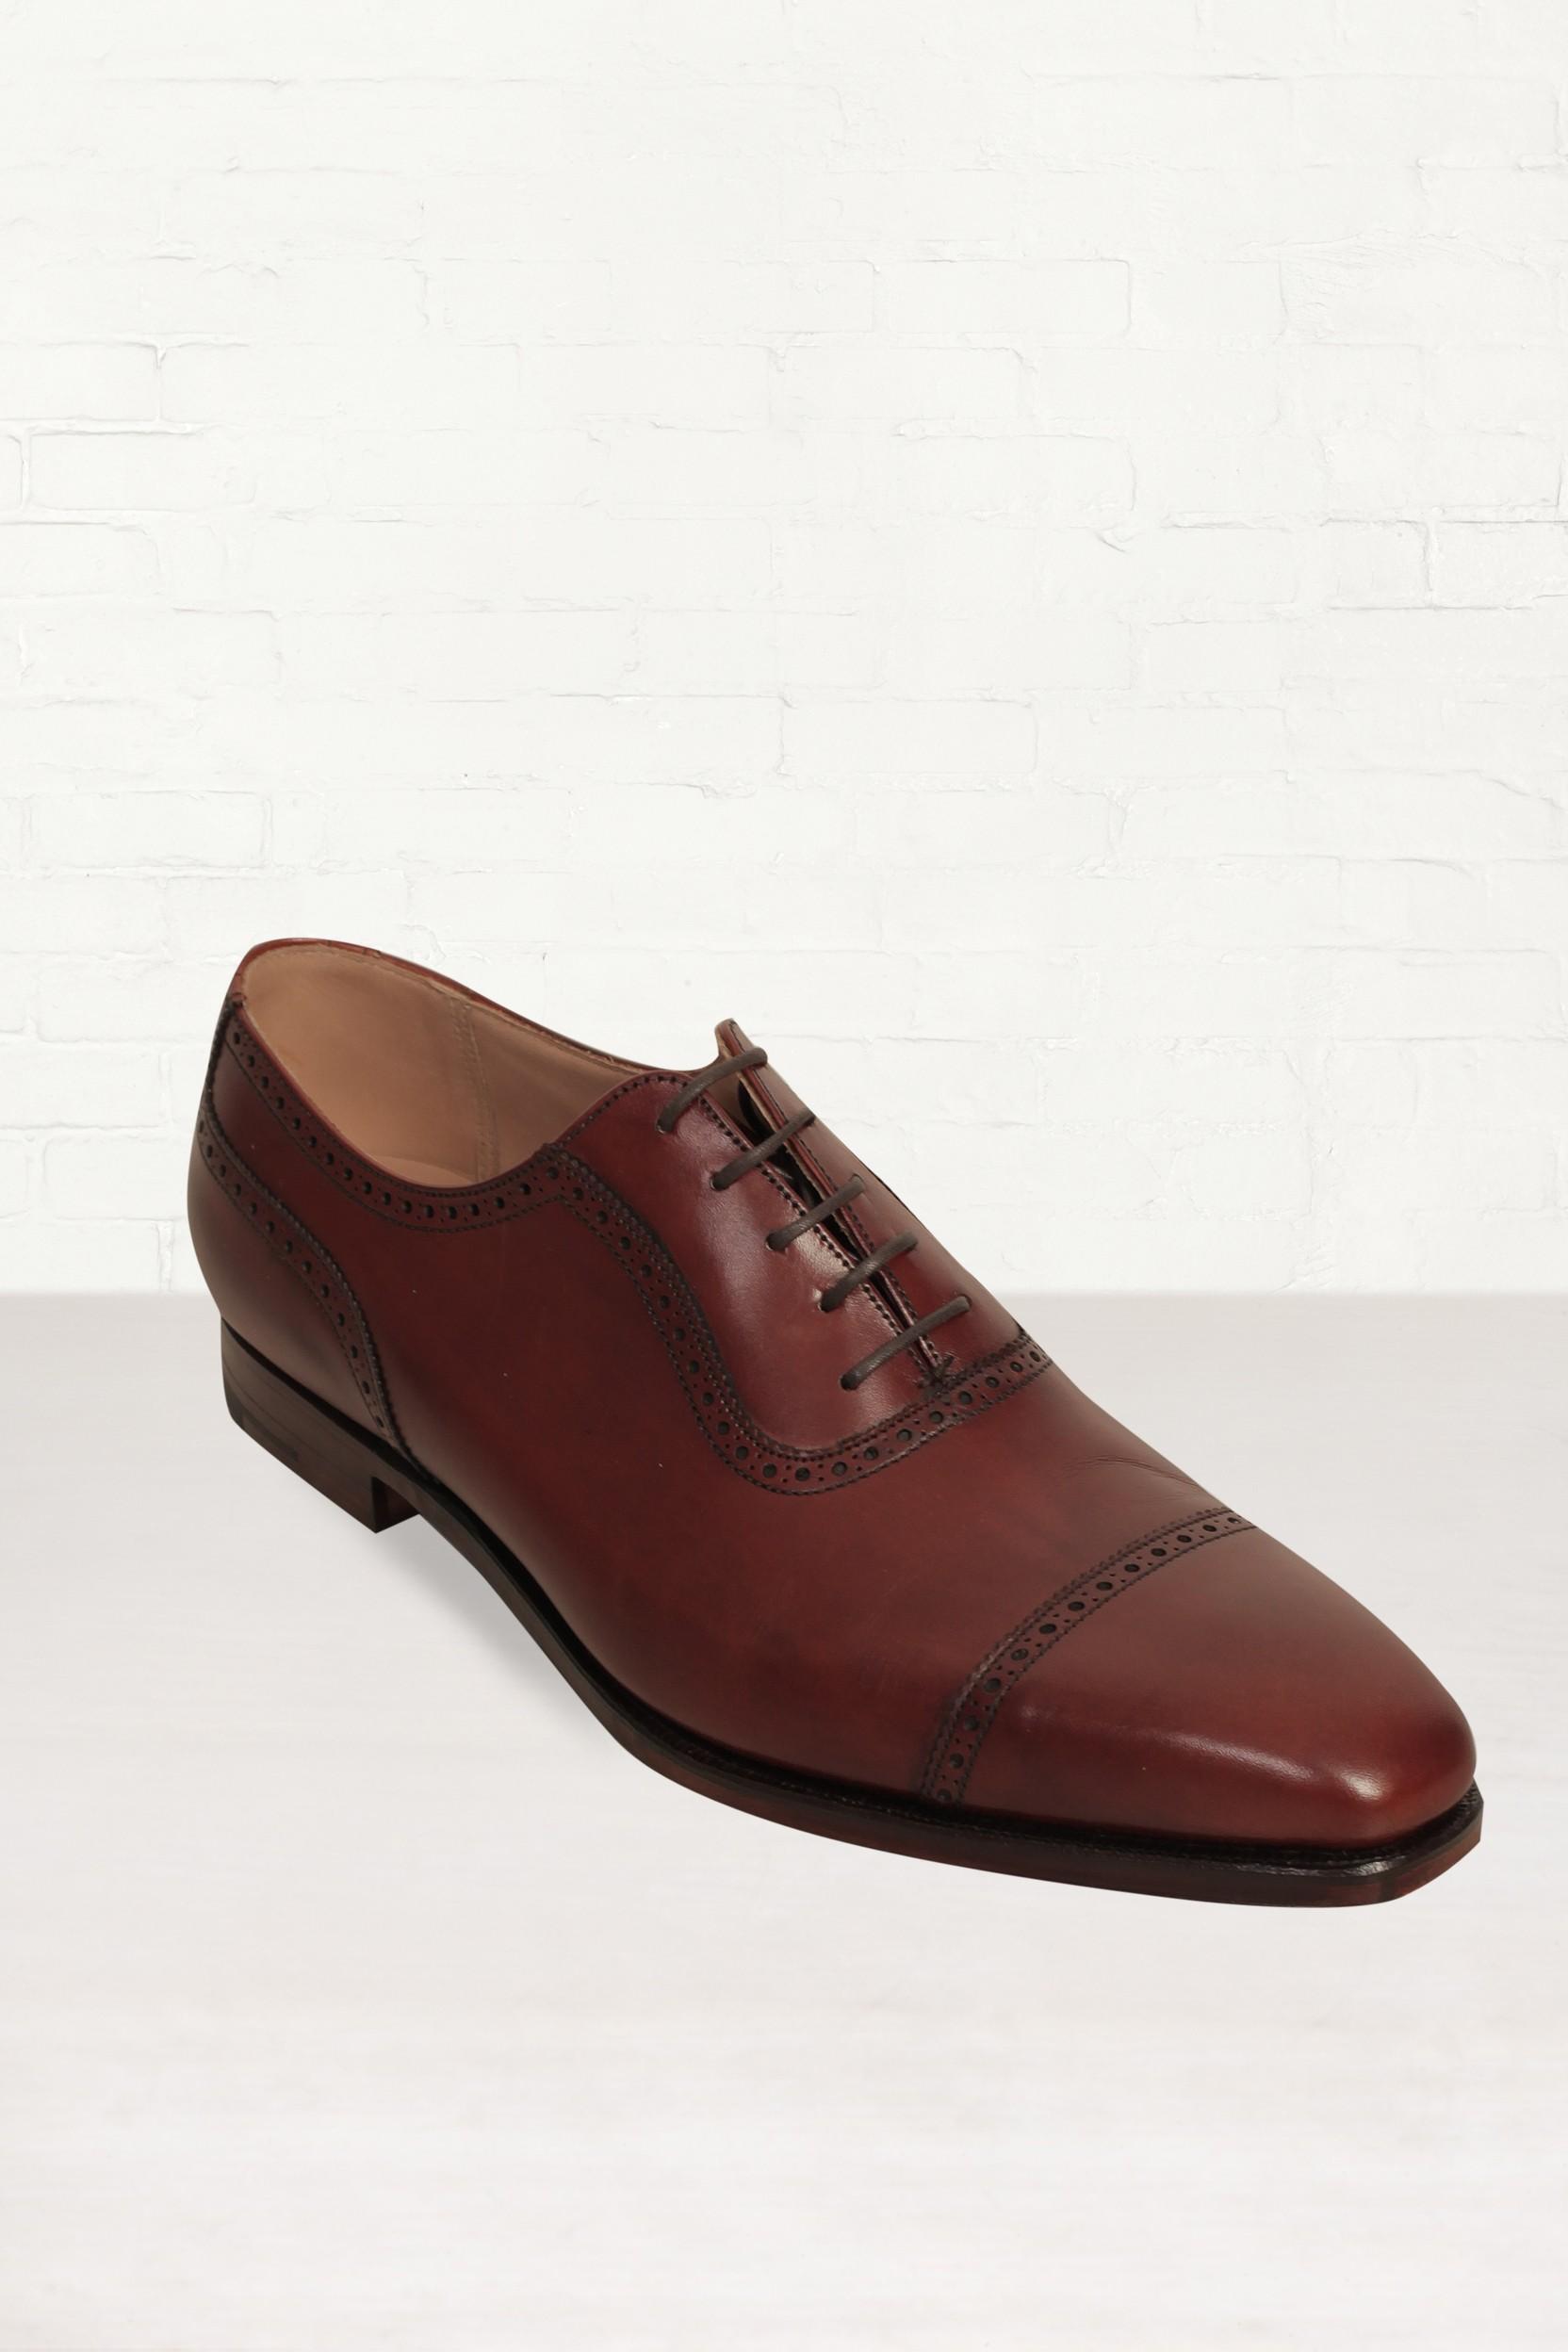 Crockett And Jones Mens Shoes Sale